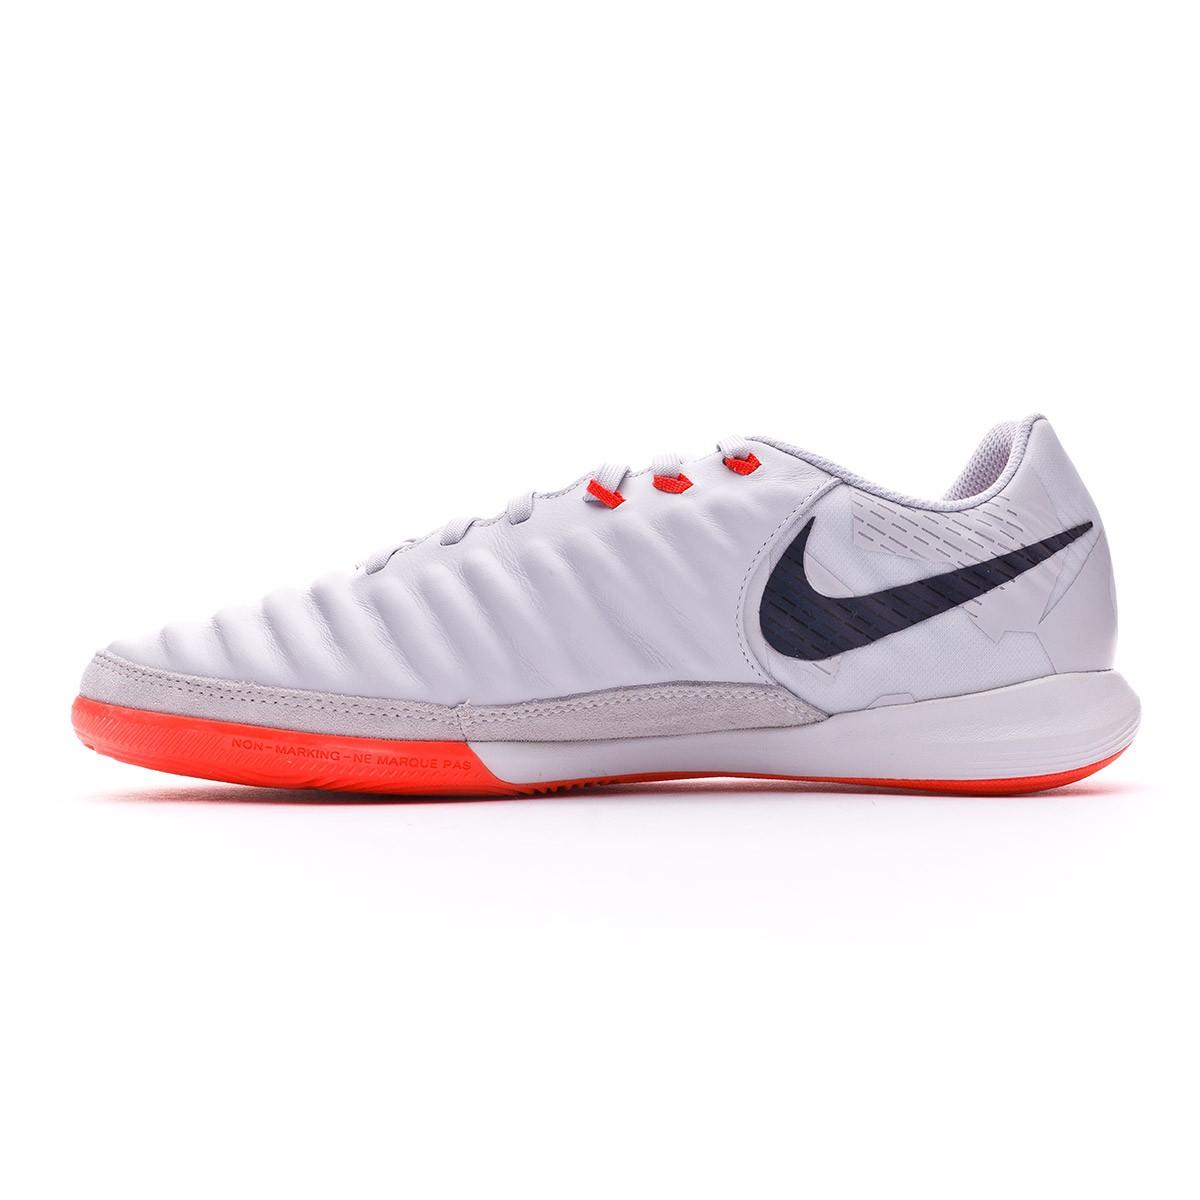 37086e061f2b8 Futsal Boot Nike TiempoX Finale Special Edition IC Pure  platinum-Black-Bright crimson - Football store Fútbol Emotion